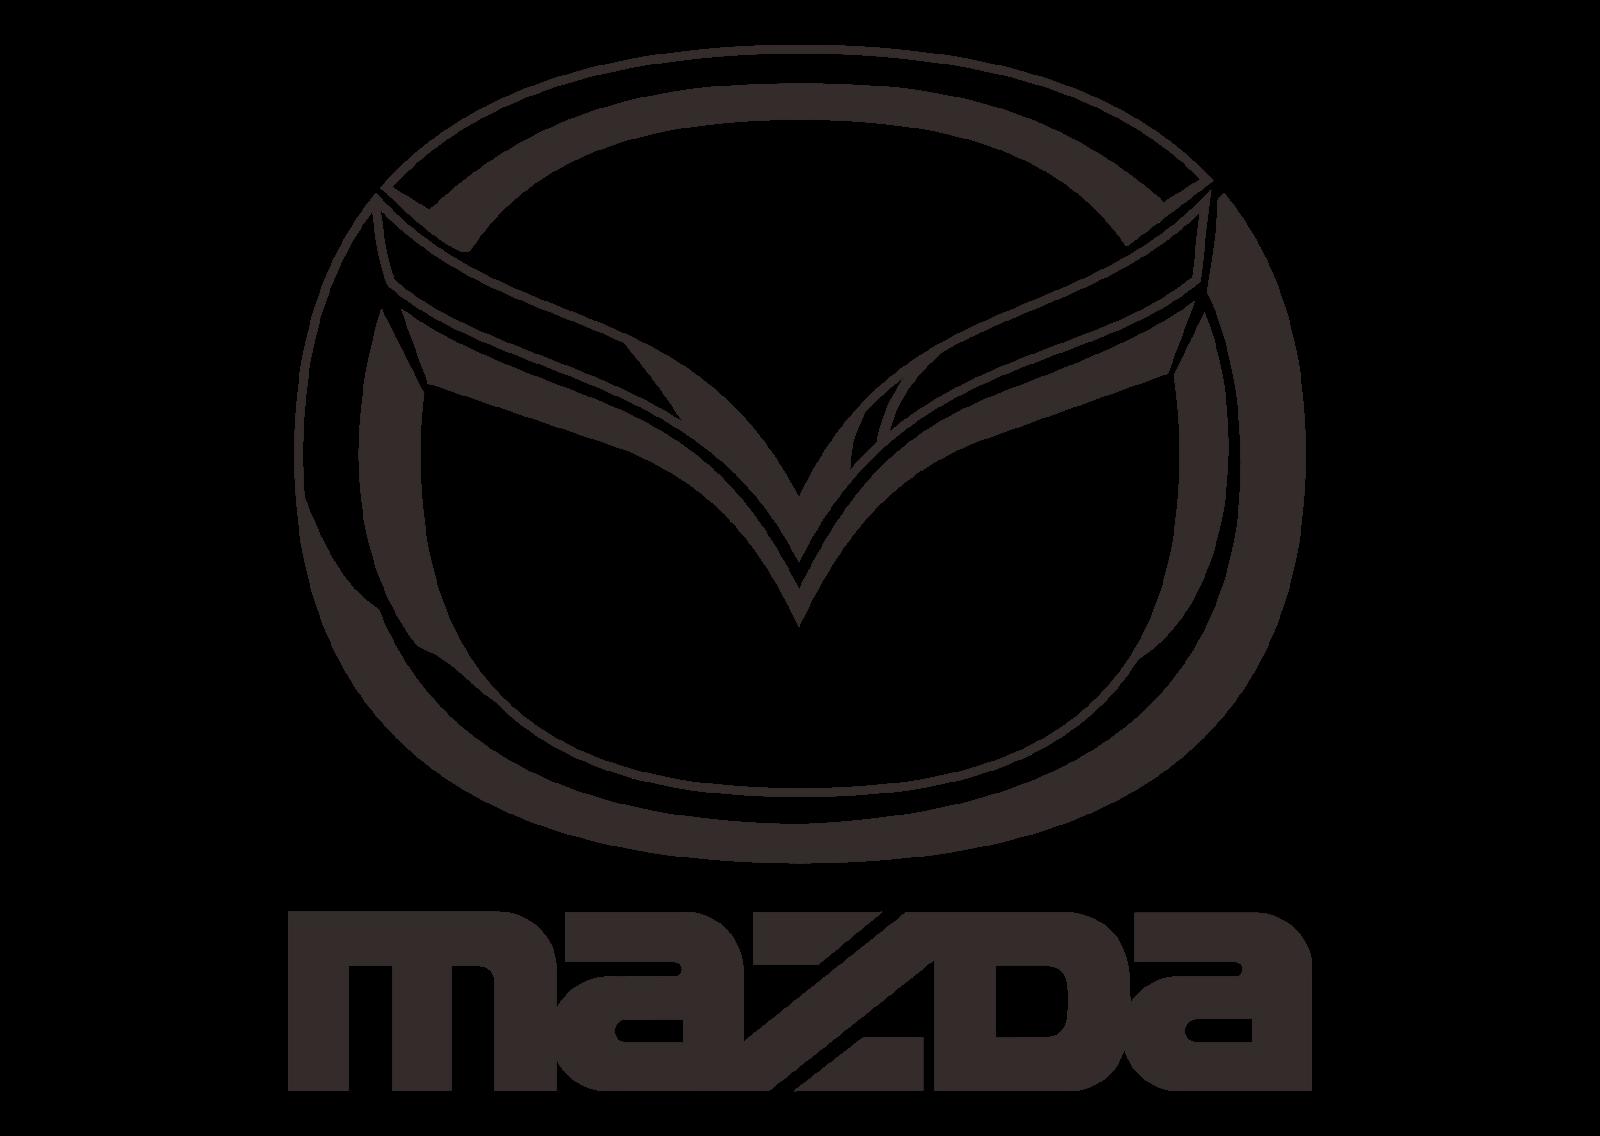 Mazda логотип PNG